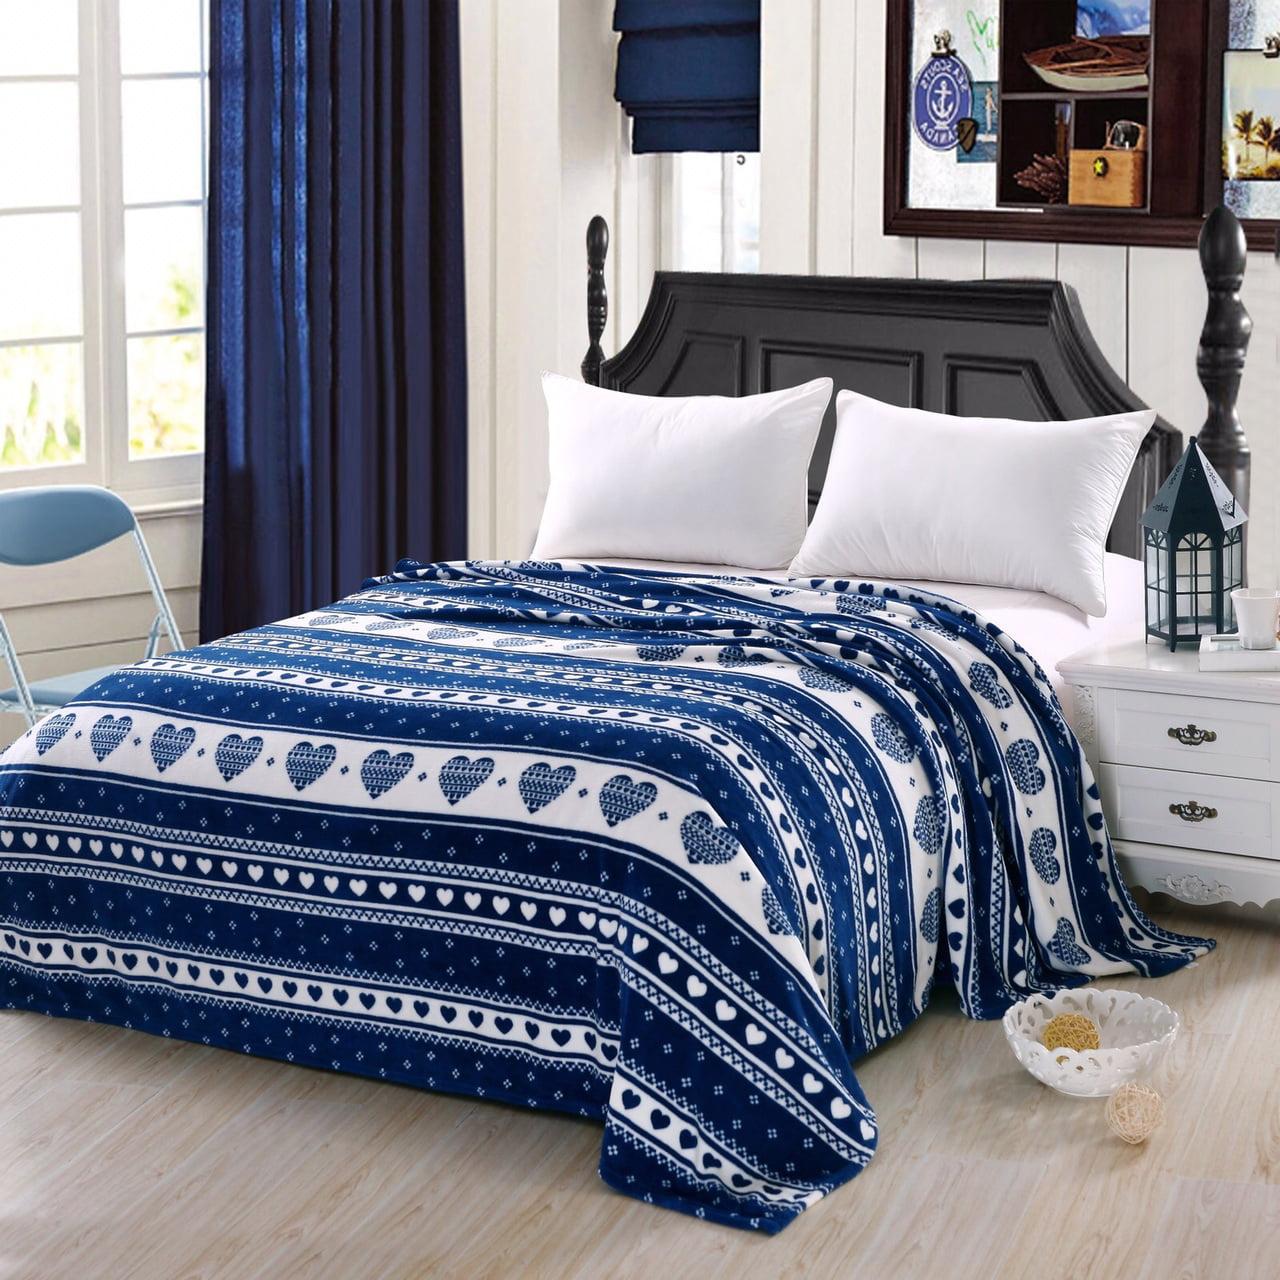 Soft Plush Heartfelt Micro Fleece Jacquard Blanket, Lovely Contemporary Pattern (Twin, Burgundy)